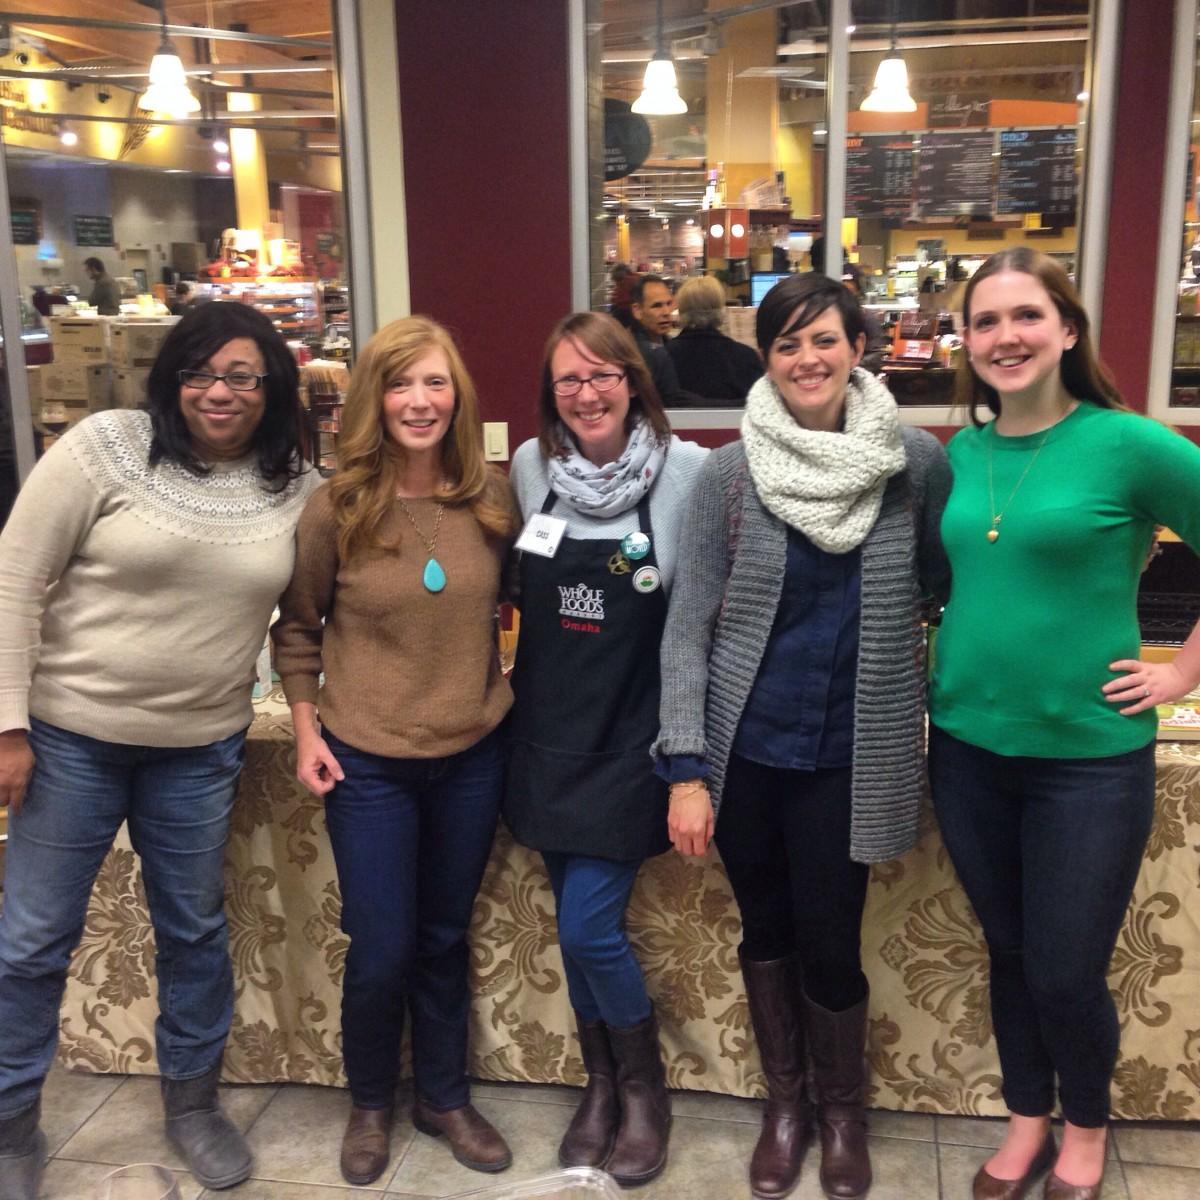 Whole Foods Omaha Blogger Event Thanksgiving Catering #sharethecheer Her Heartland Soul Erin Fairchild